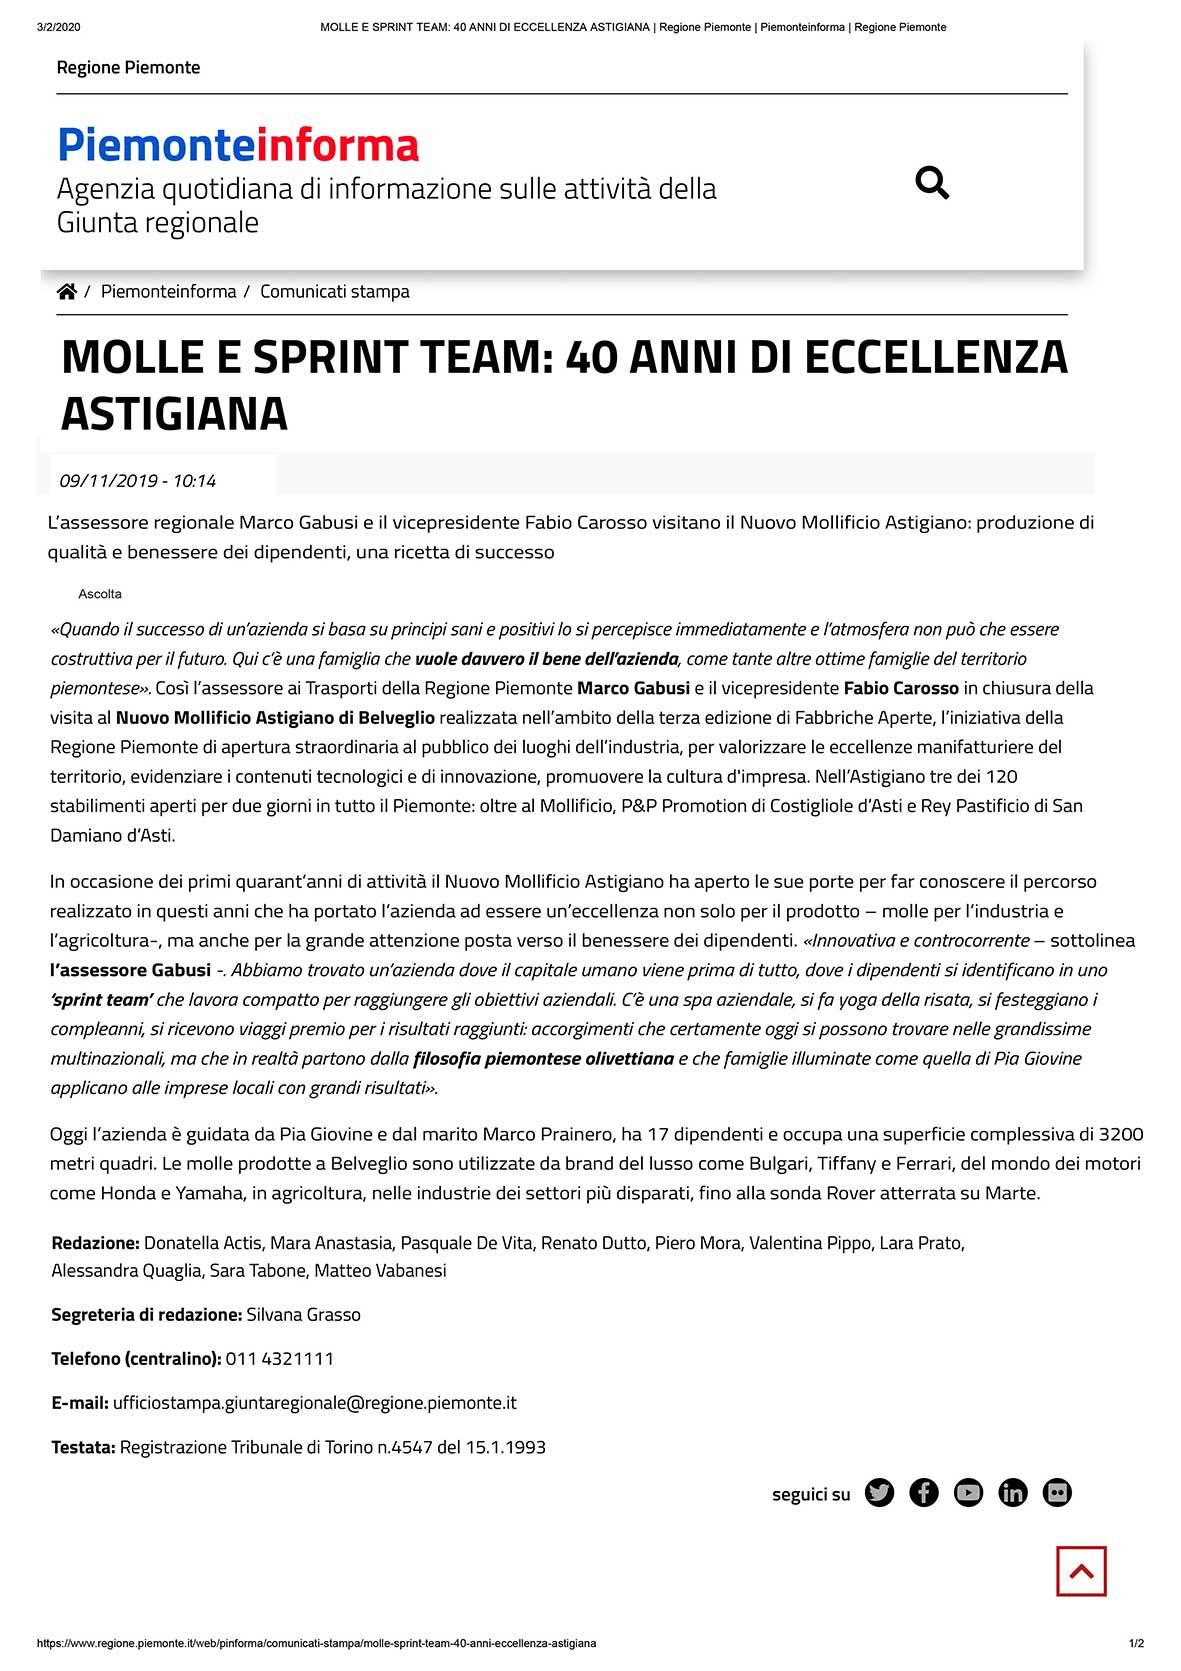 piemonte informa nov 2019_40anni